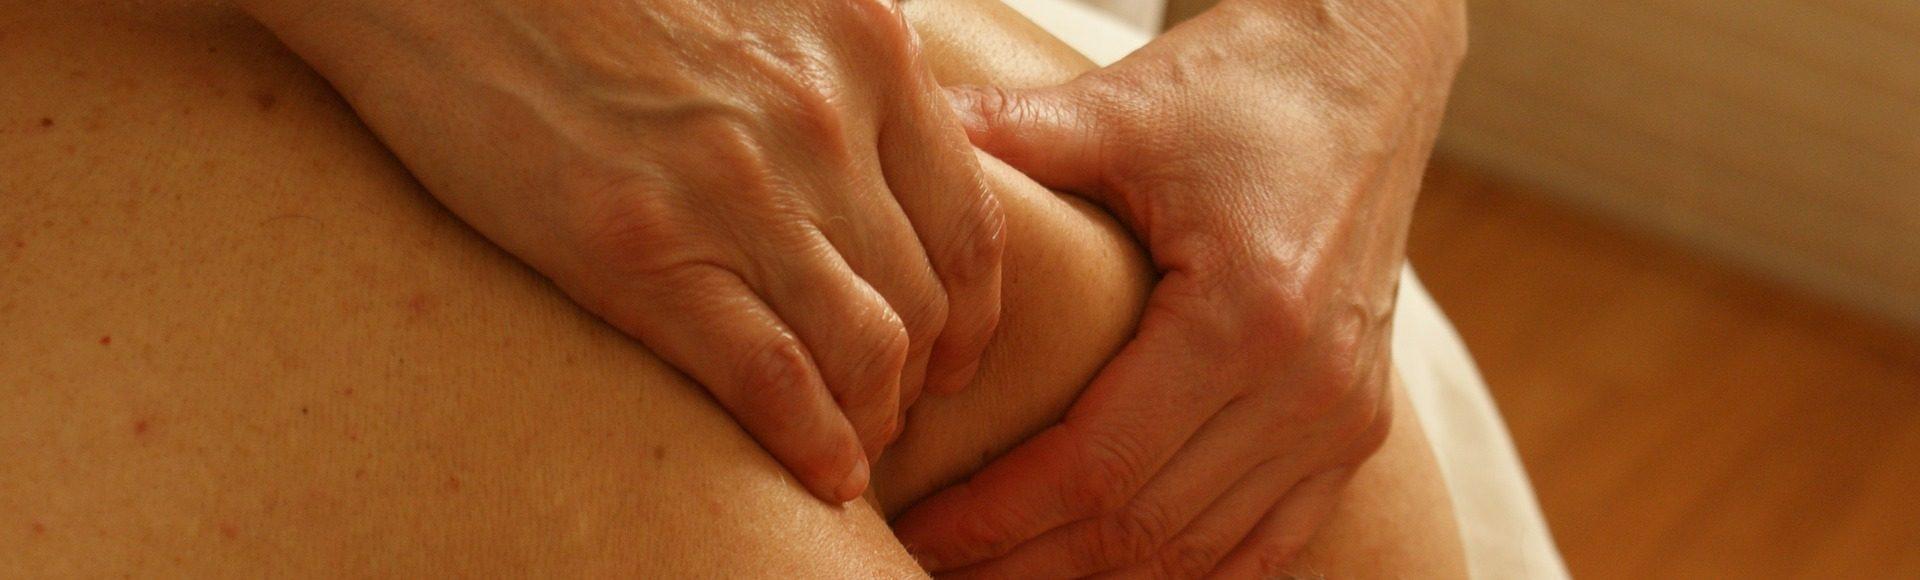 Spalla congelata: Tra i rimedi vi è l'osteopatia.